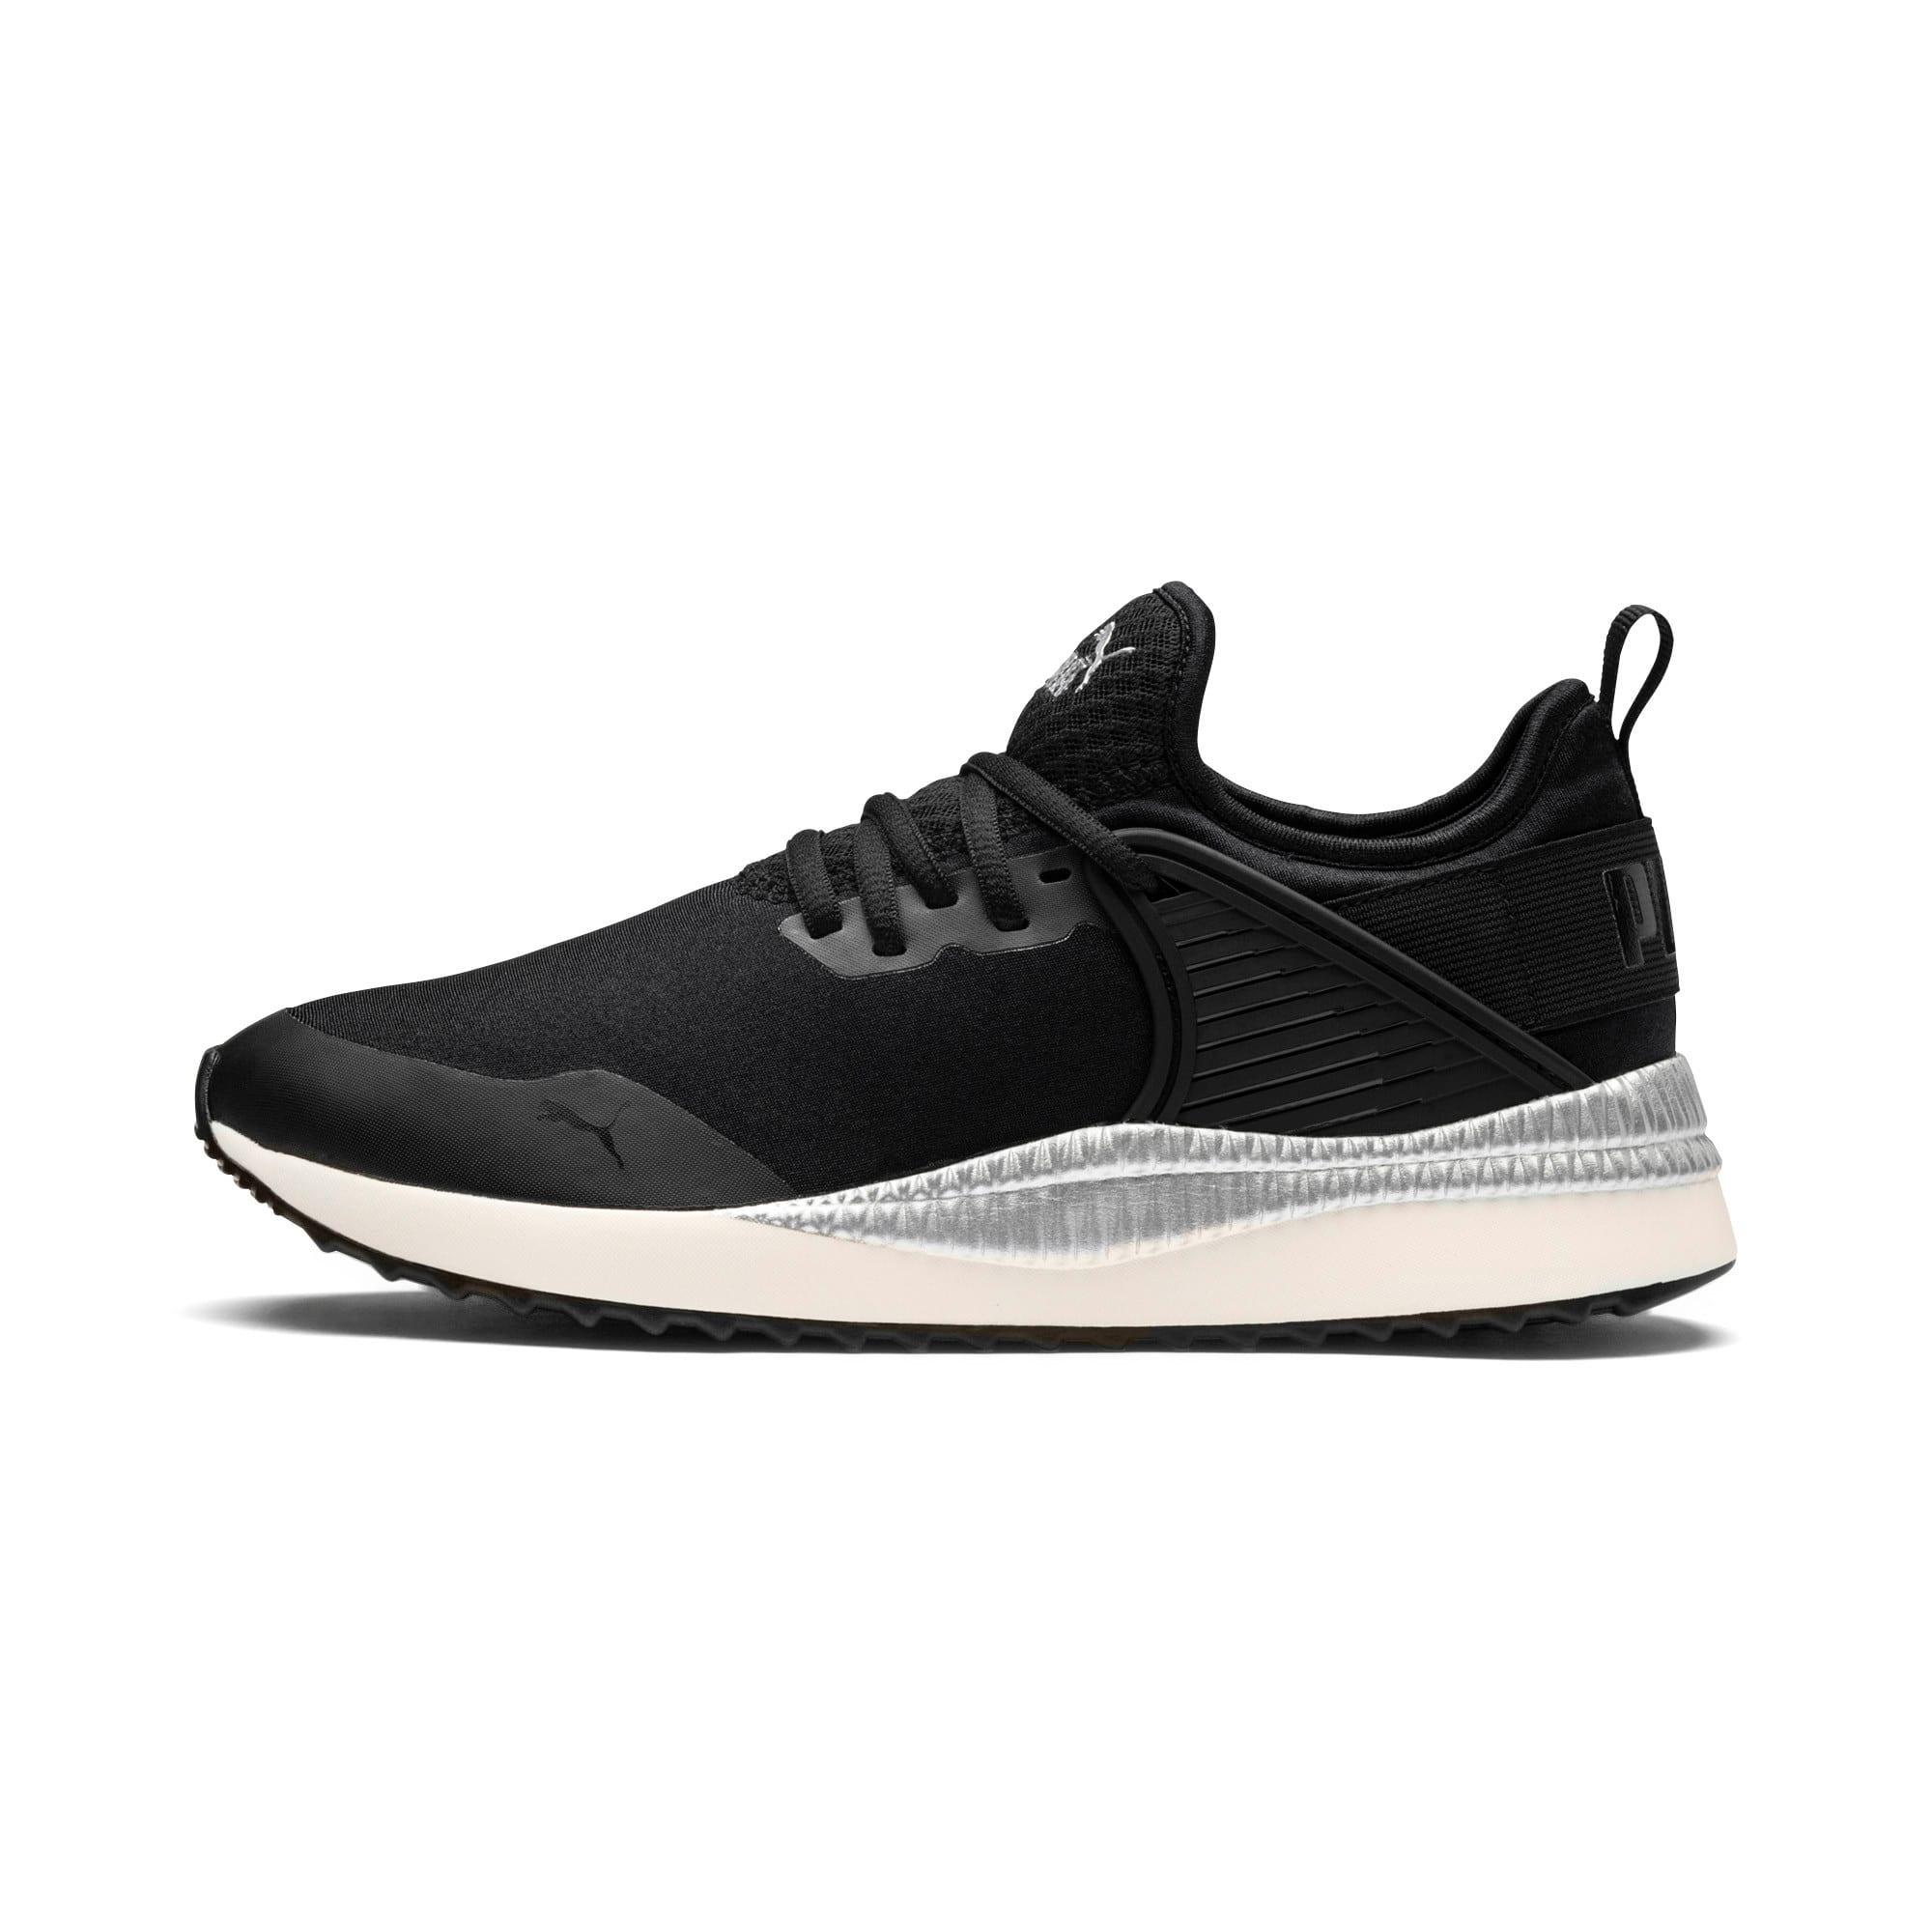 Thumbnail 1 of Pacer Next Cage ST2 Women's Sneakers, P Black-Black-Whisper White, medium